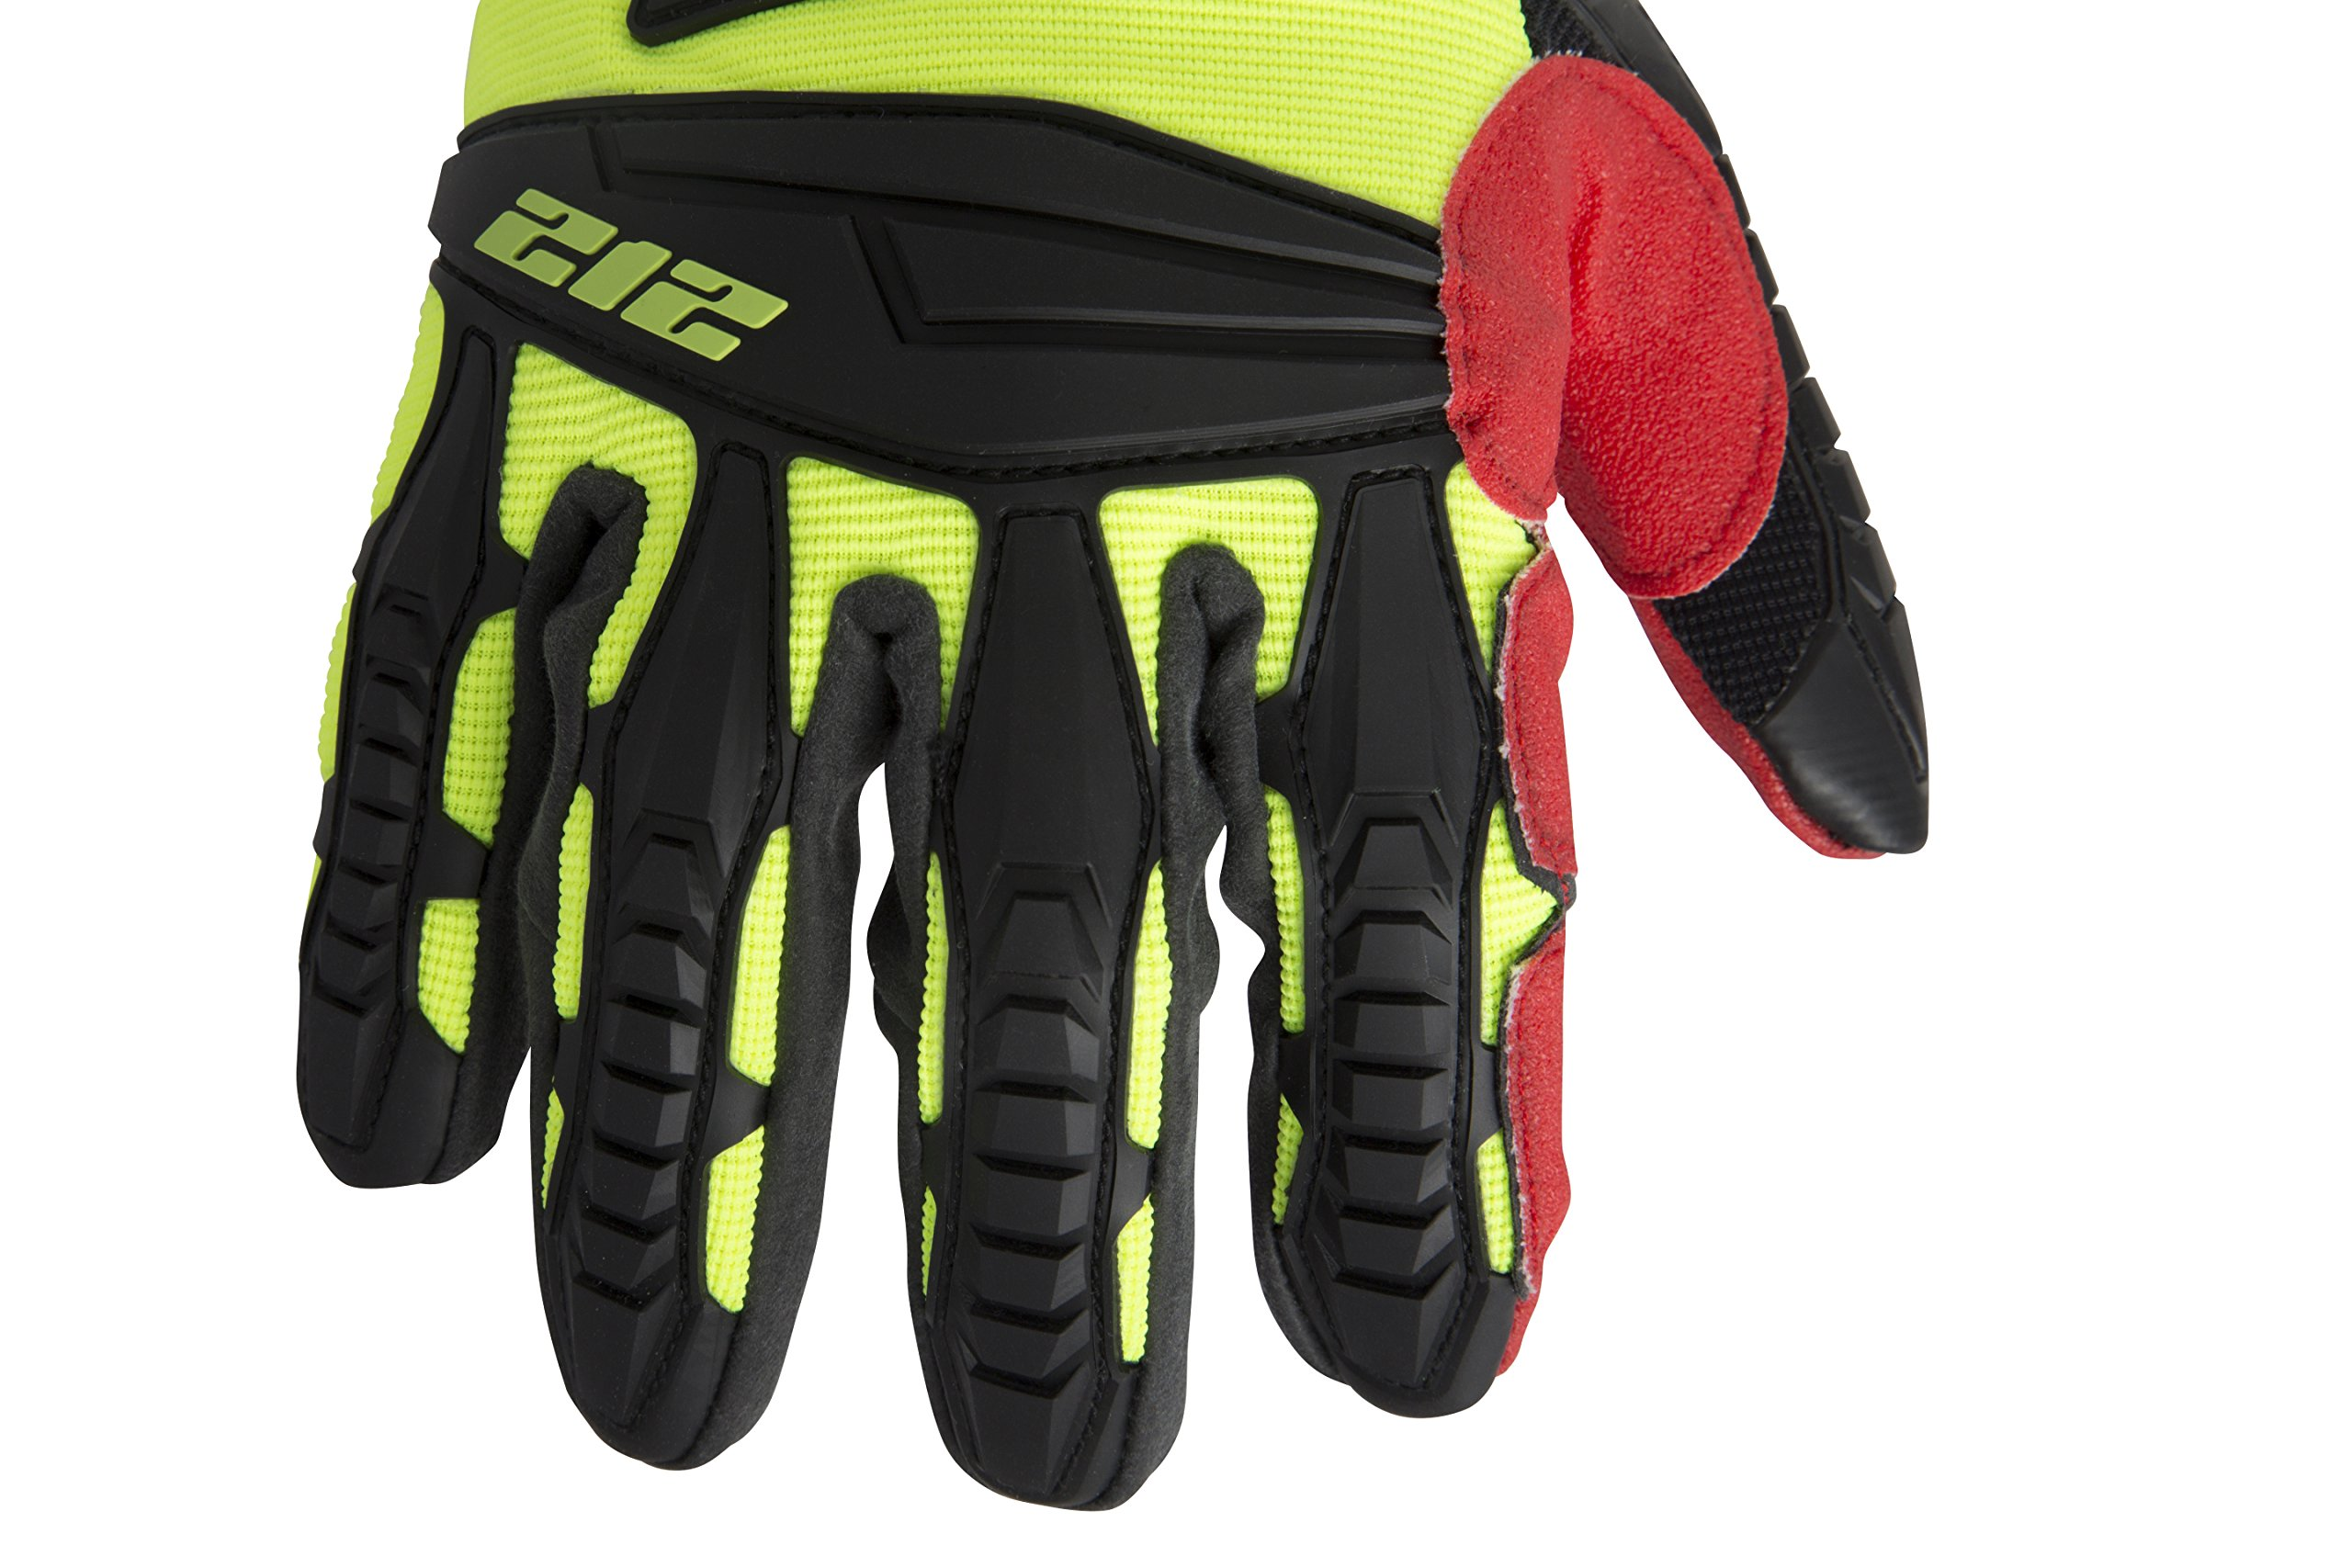 212 Performance Gloves IMP-88-009 Super Hi-Vis Impact Gloves, Medium by 212 Performance Gloves (Image #5)